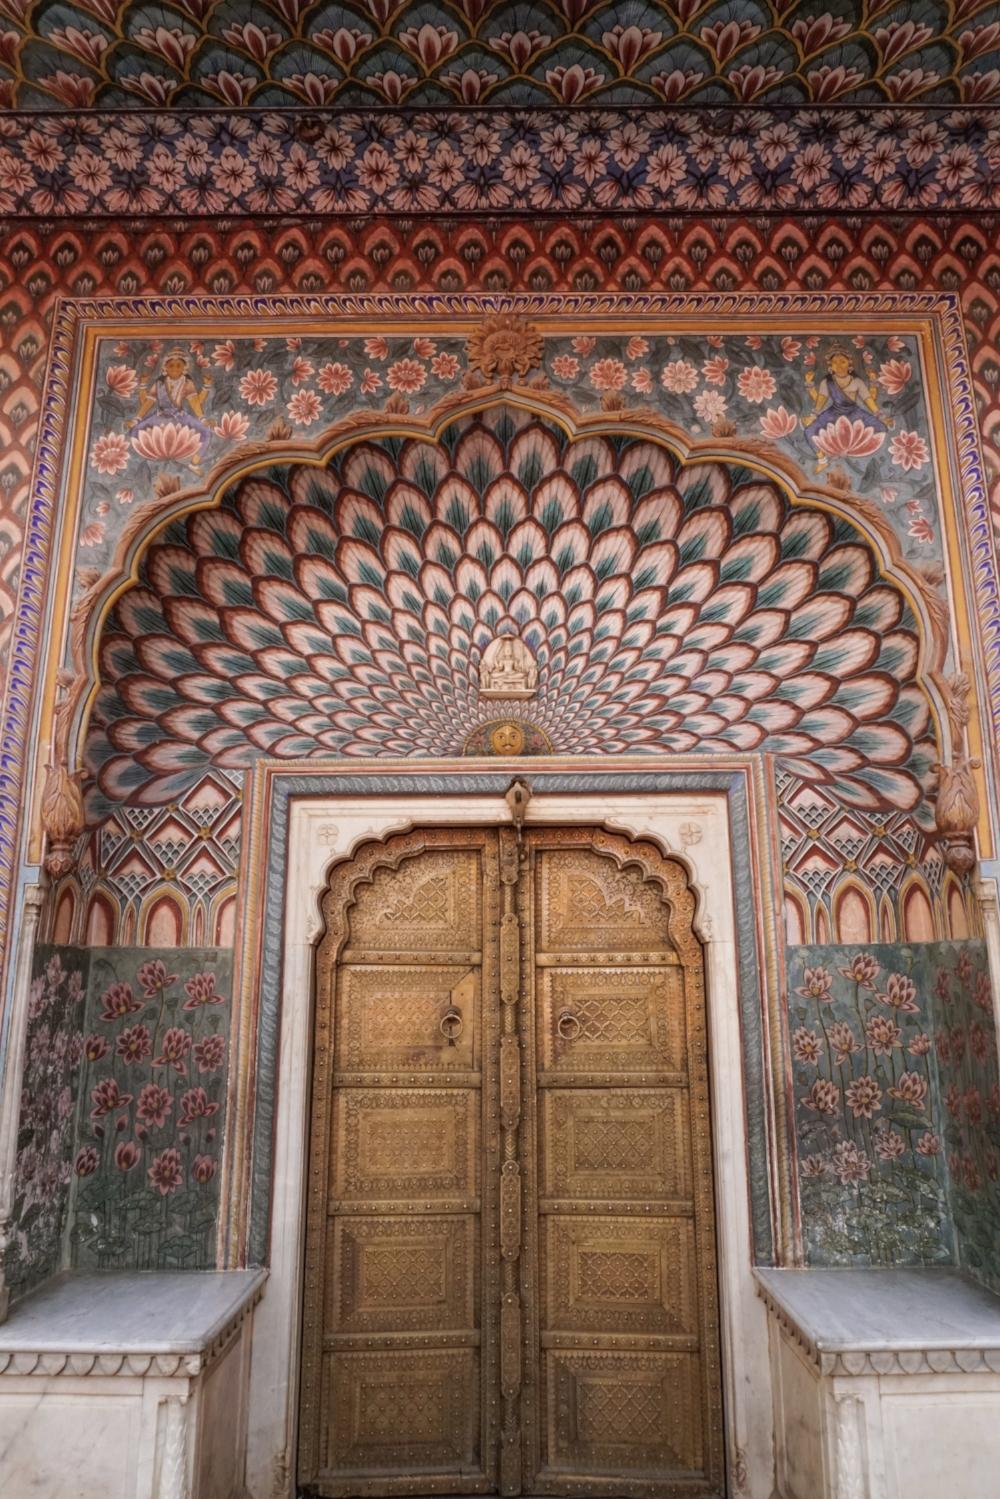 curio.trips.india.jodhpur.peacock.door.jpg